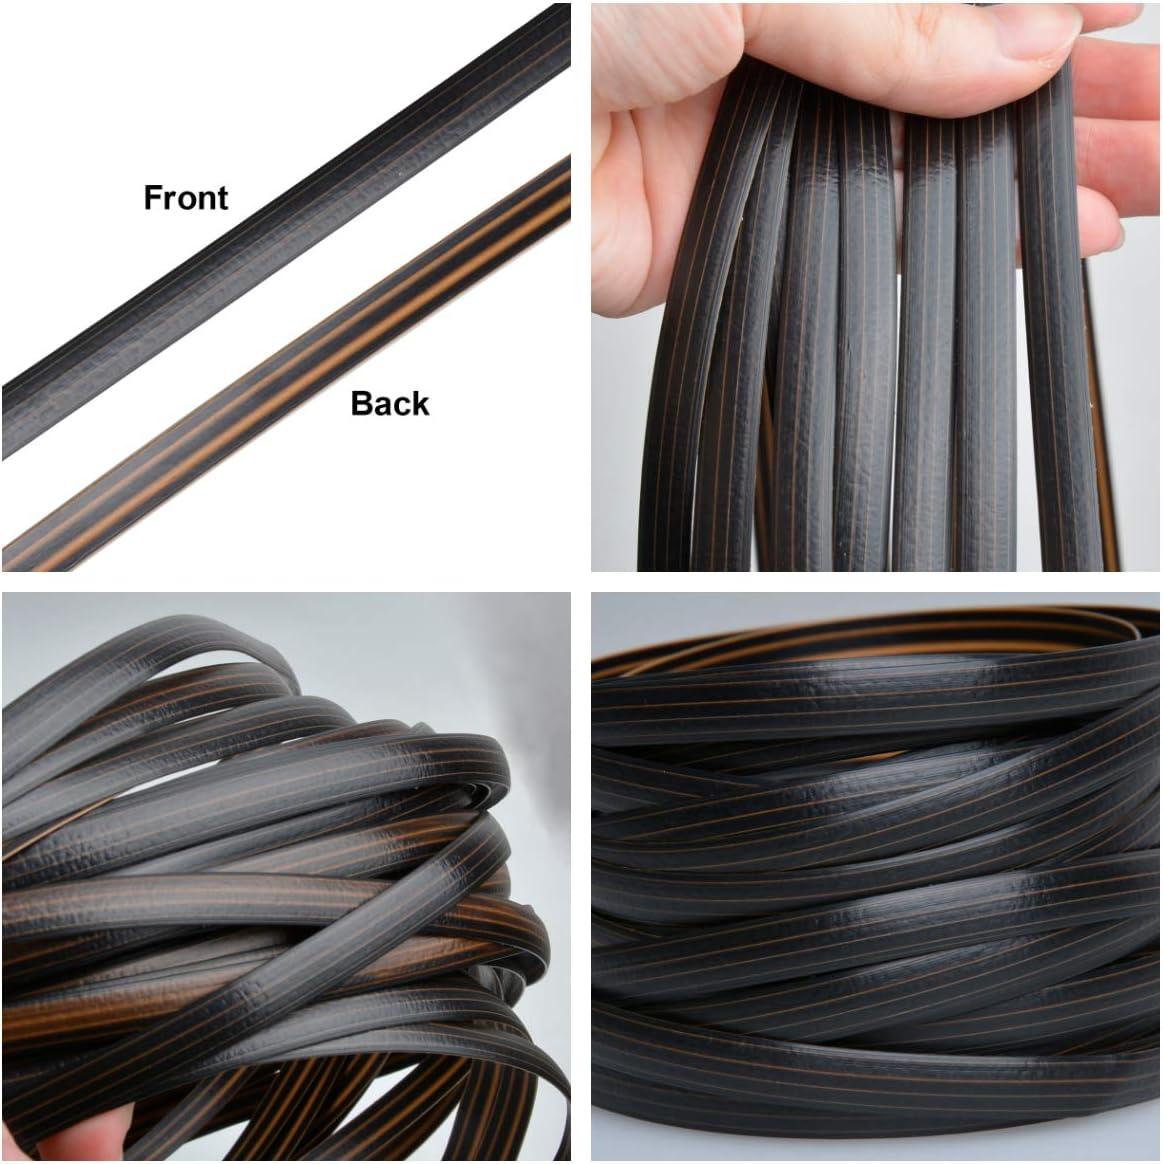 Black /& Coffe Flat Synthetic Rattan Queenbox 0.3 in x 32.8 ft 8mm Plastic PE Rattan Repair Materials for Knit DIY Art Craft Furniture Sofa Table Storage Basket 10m